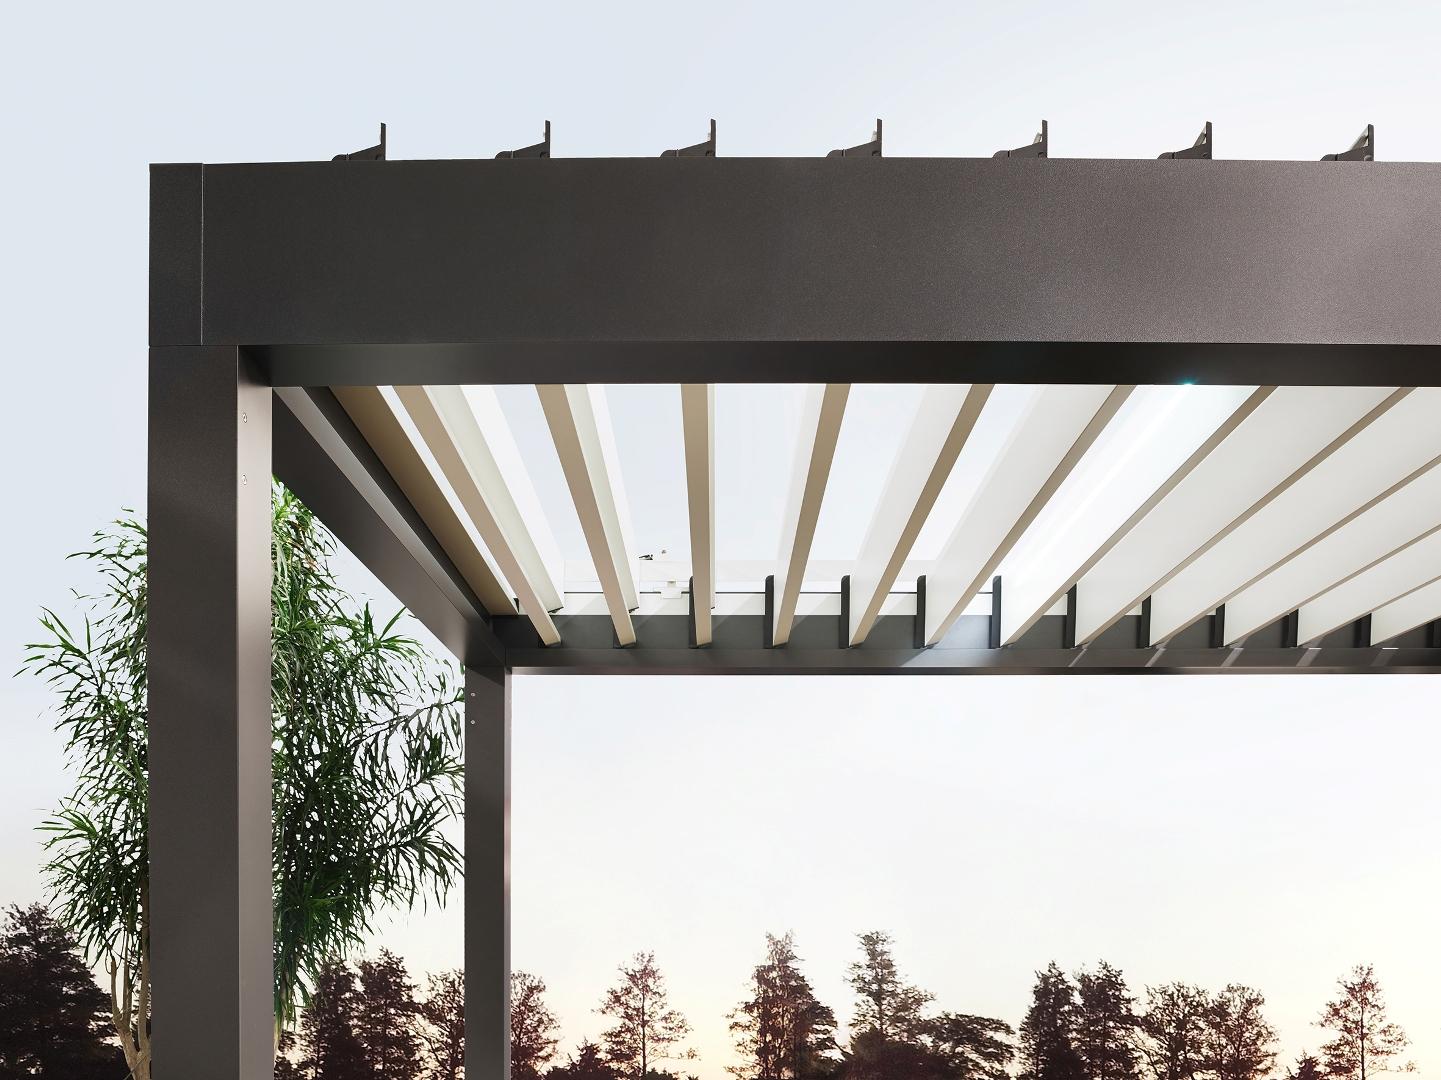 Full Size of Terrassen Pavillon Metall Obi Bauhaus Test Alu Wasserdicht Terrasse Pergola Aluminium Gestell Kaufen Freistehend Winterfest Garten Wohnzimmer Terrassen Pavillon